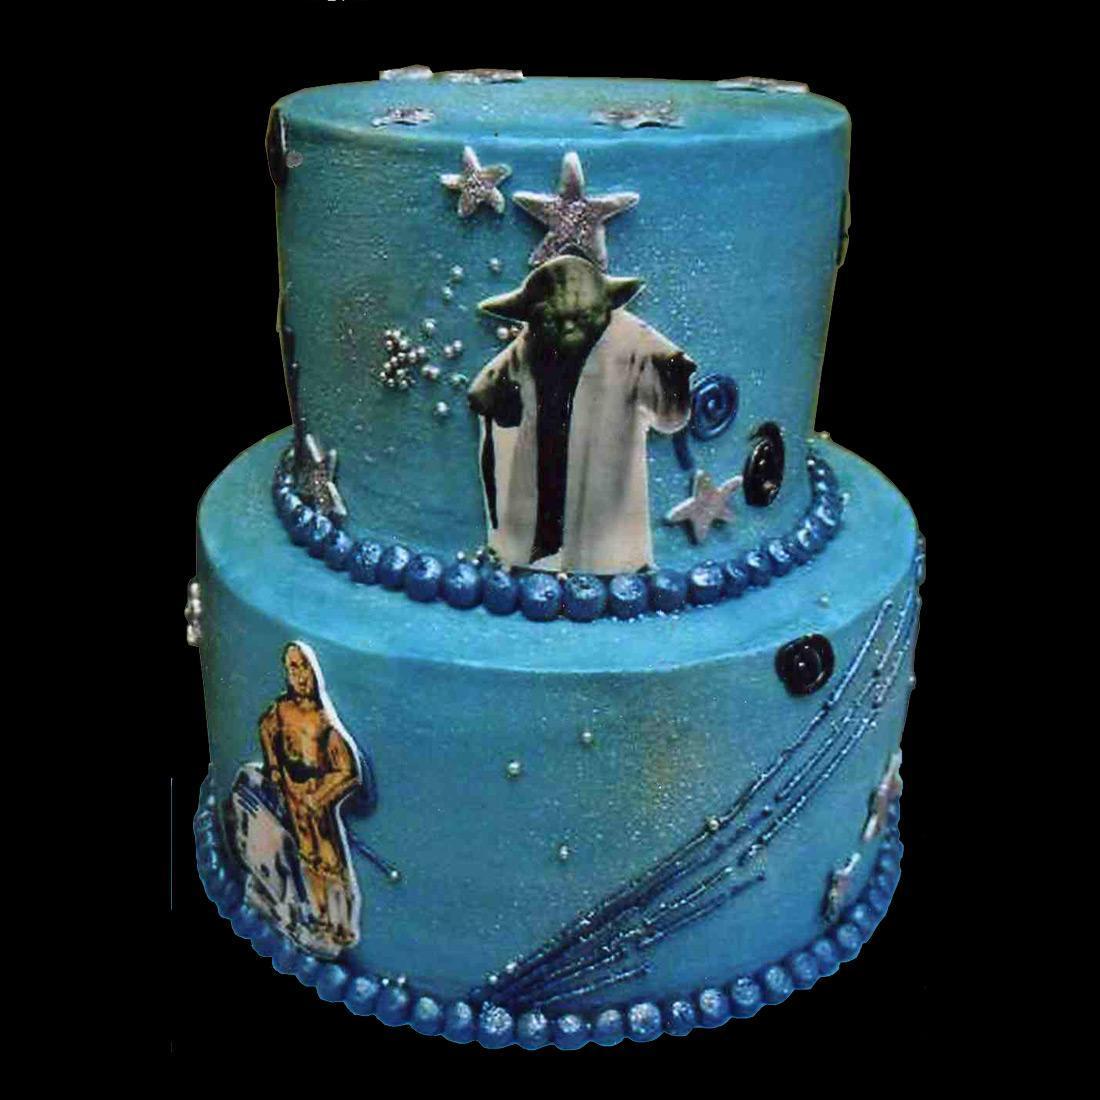 Swell Star Wars Birthday Cakesbest Birthday Cakesbest Birthday Cakes Funny Birthday Cards Online Alyptdamsfinfo